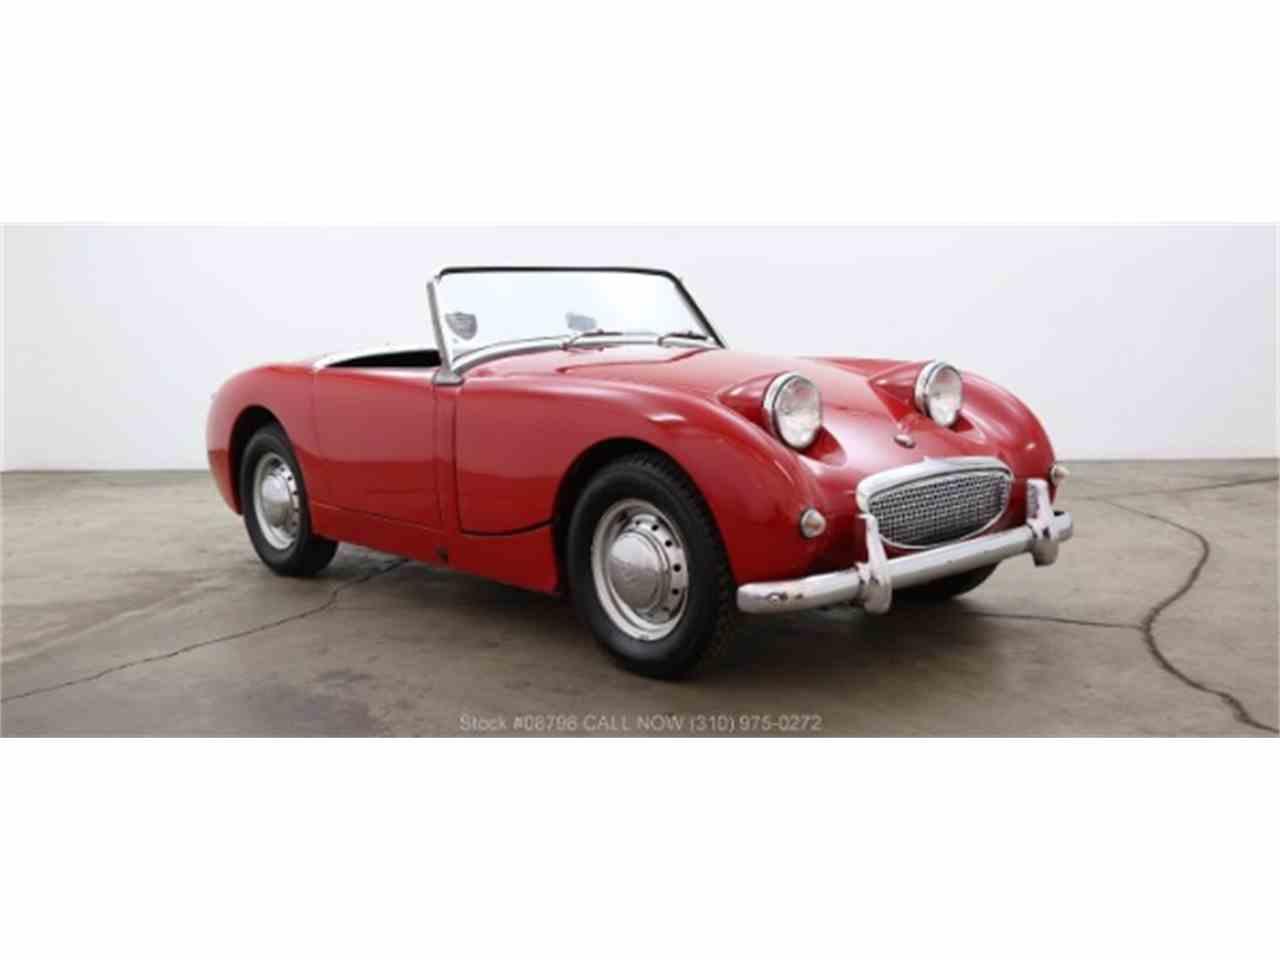 1960 Austin Healey Bugeye Sprite For Sale Cc